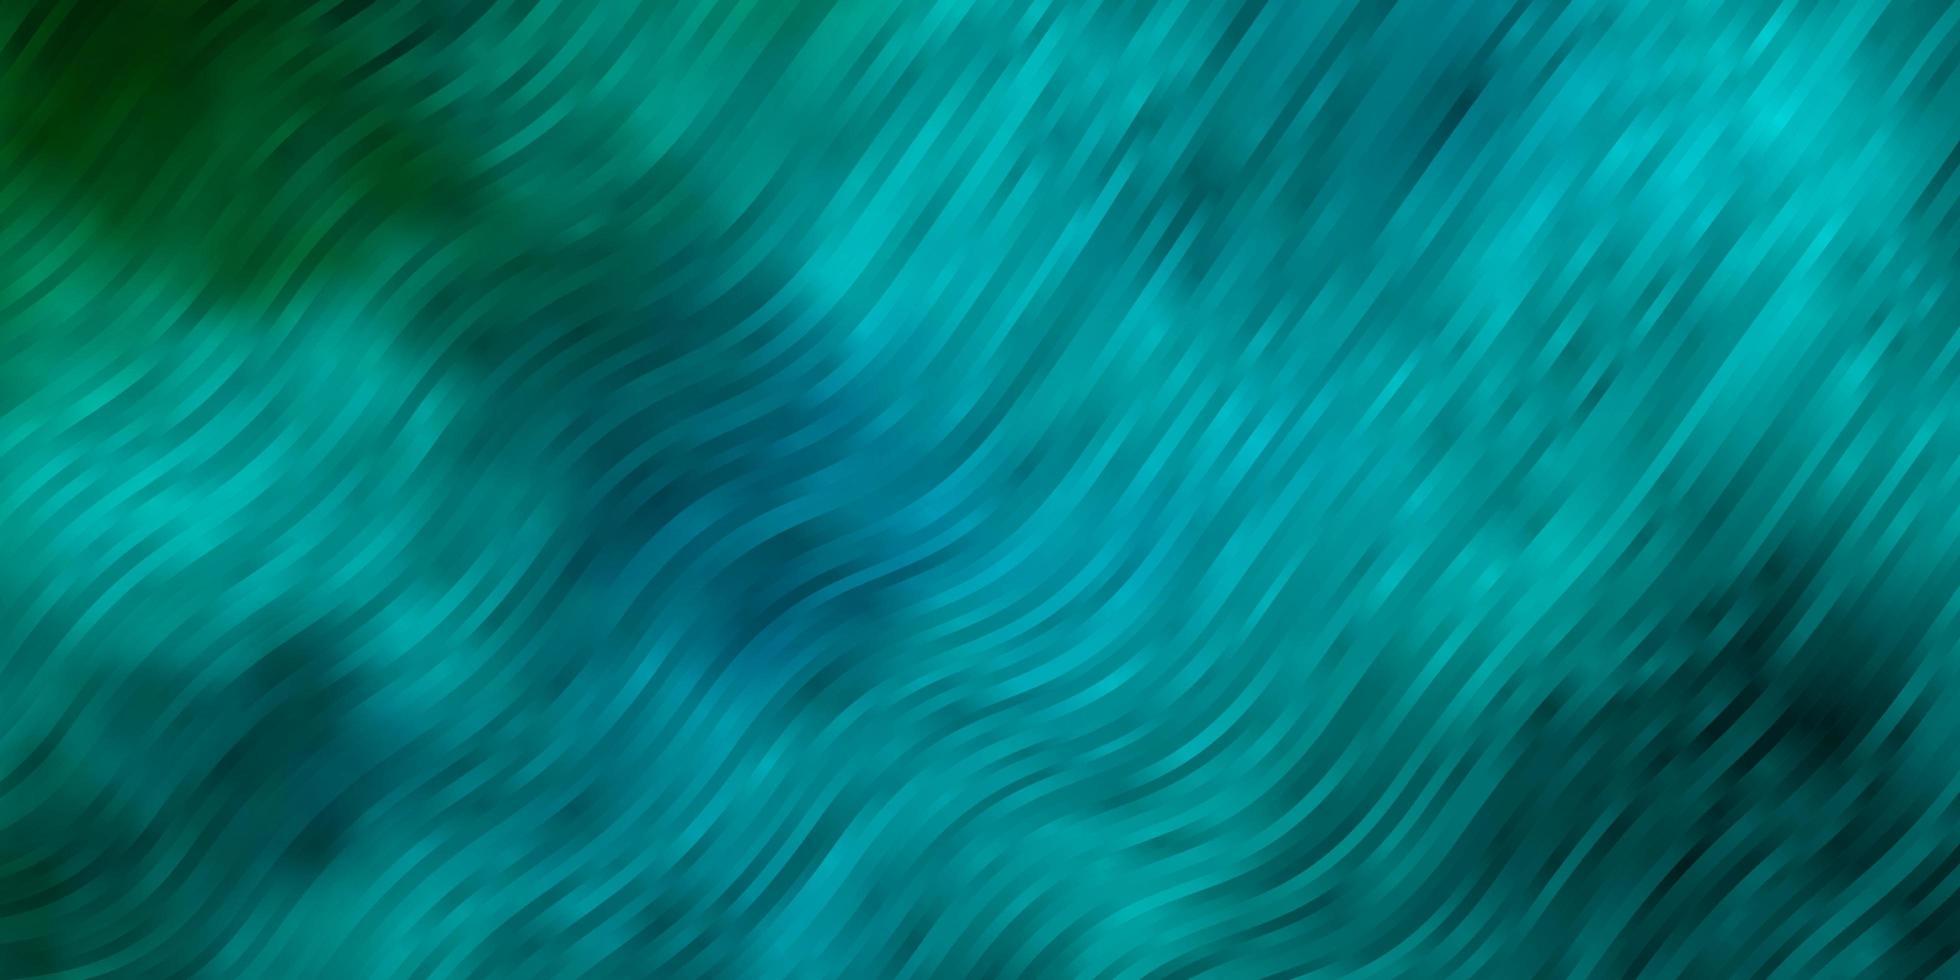 lichtblauwe, groene vectorlay-out met curven. vector